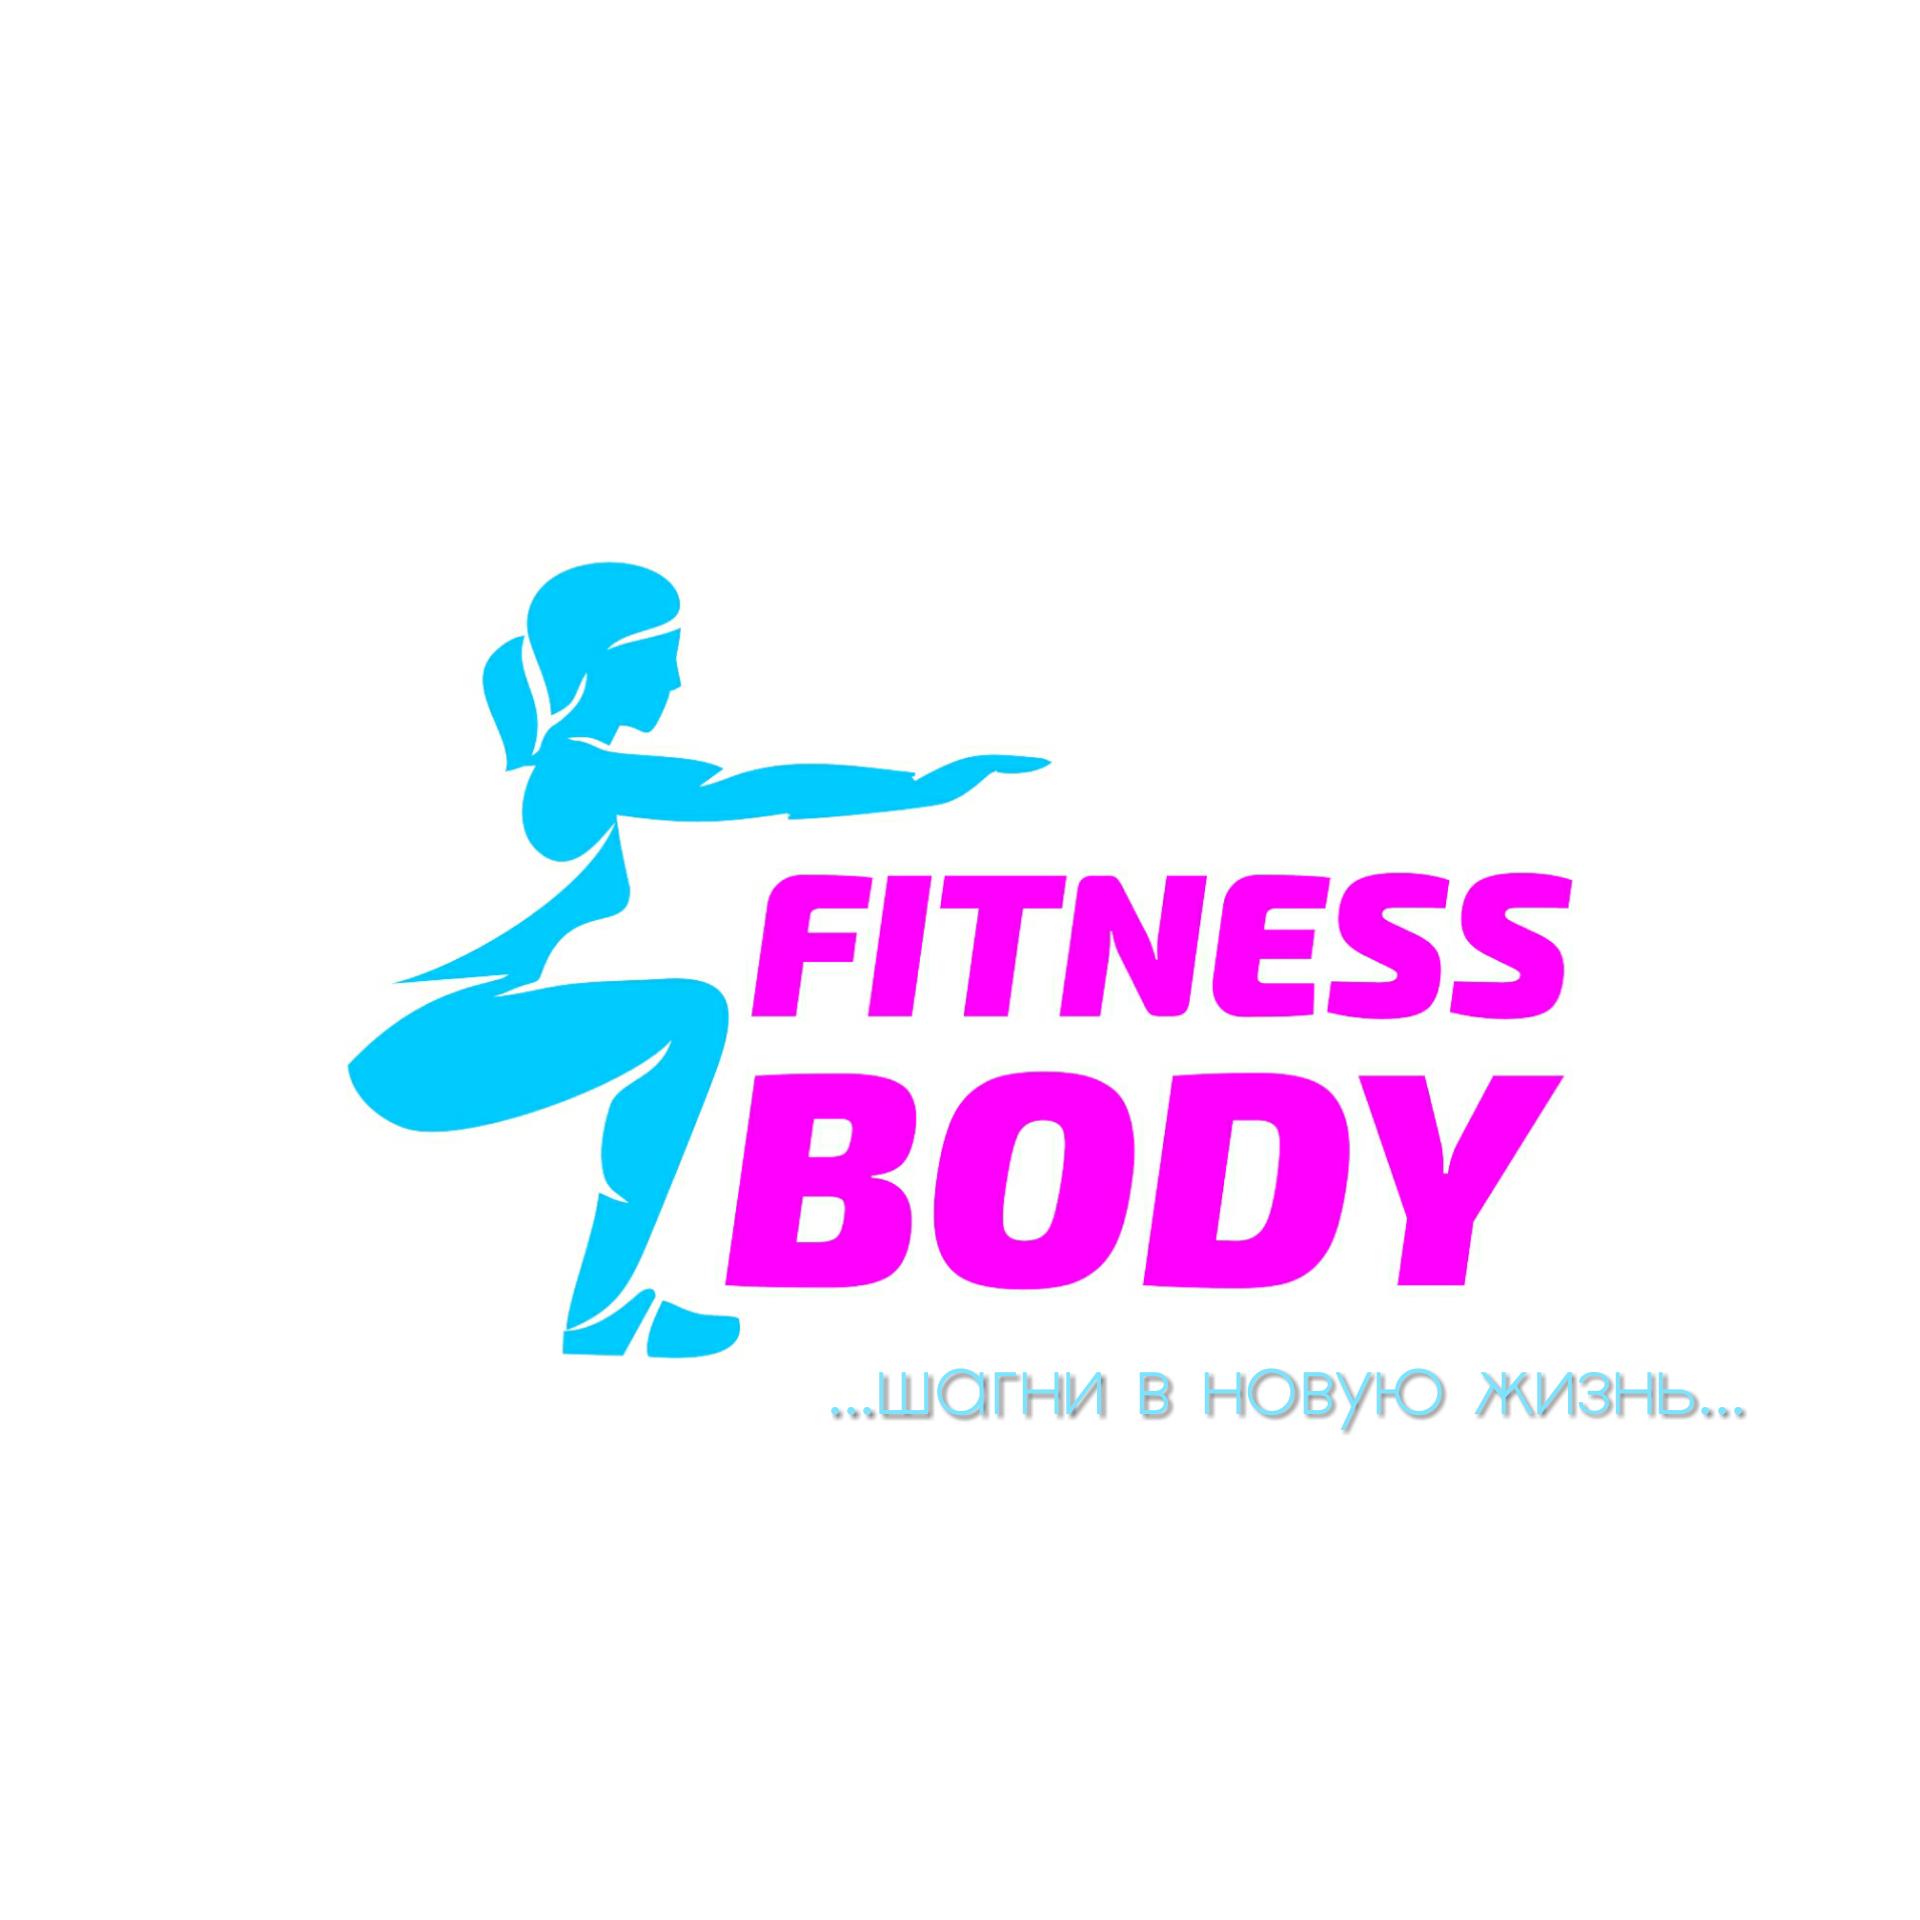 https://www.instagram.com/fitness_body_chita/?hl=ru